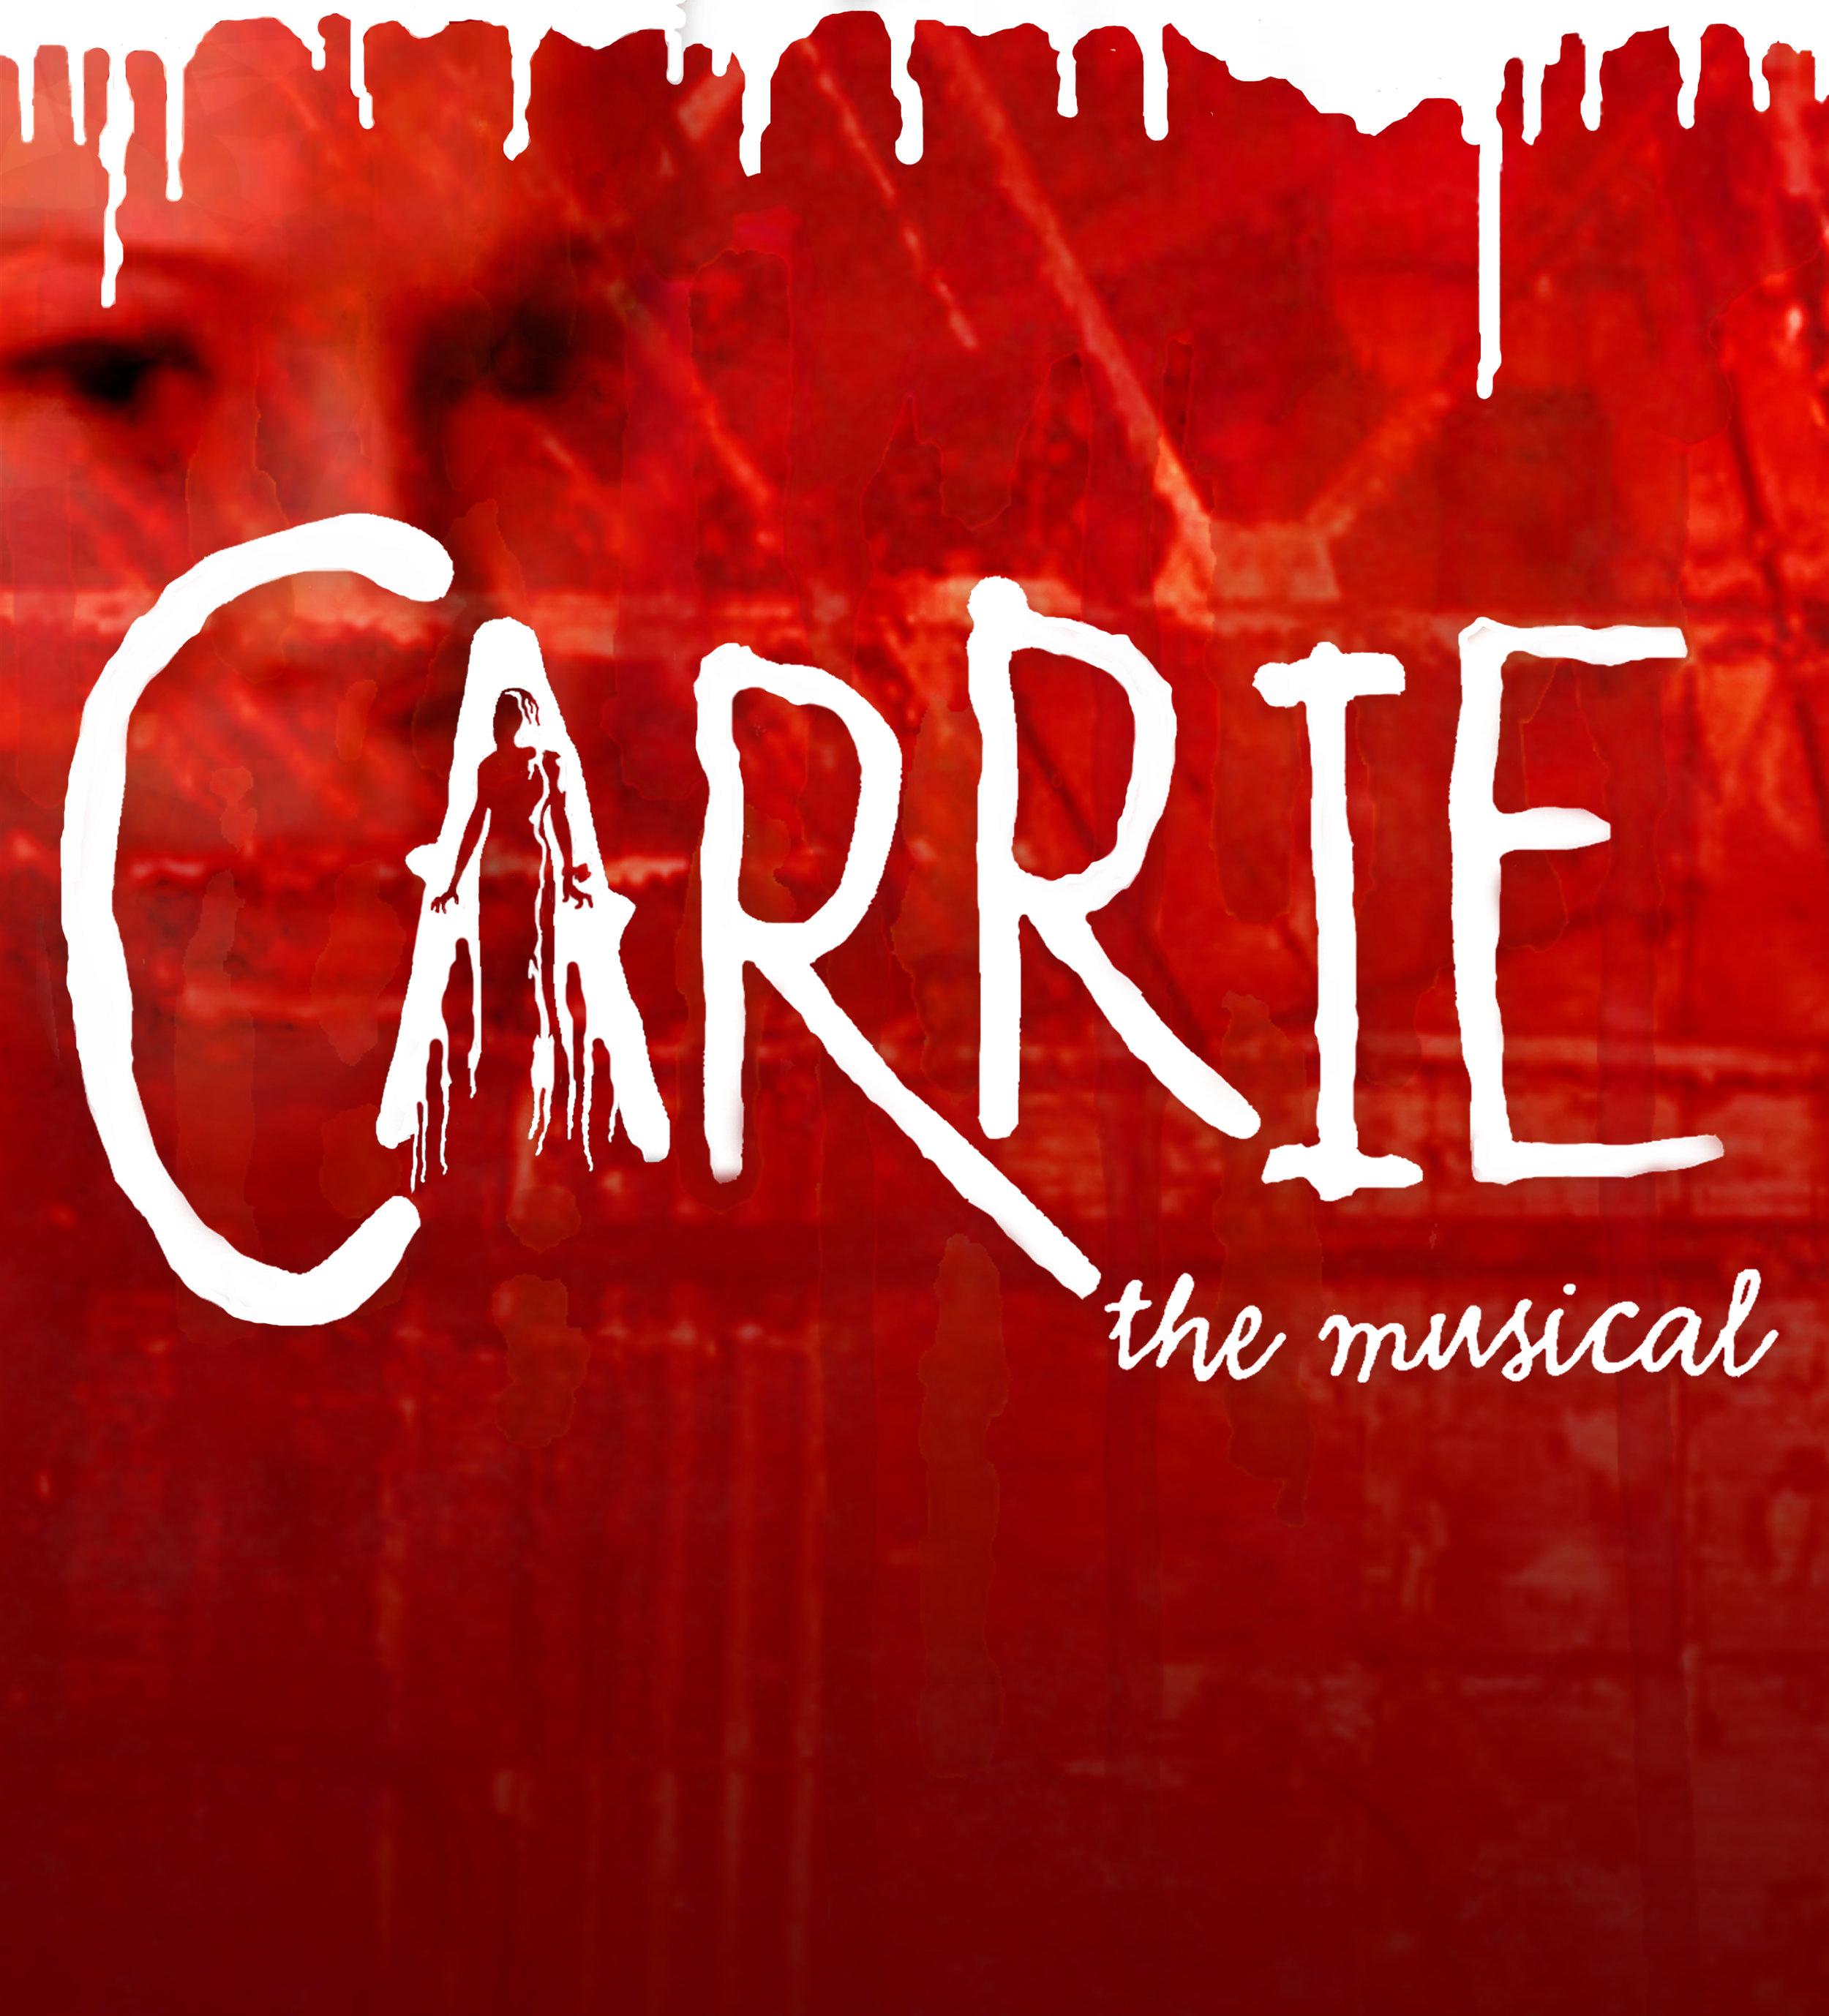 CARRIE-the-musical-Thumbnail.jpg